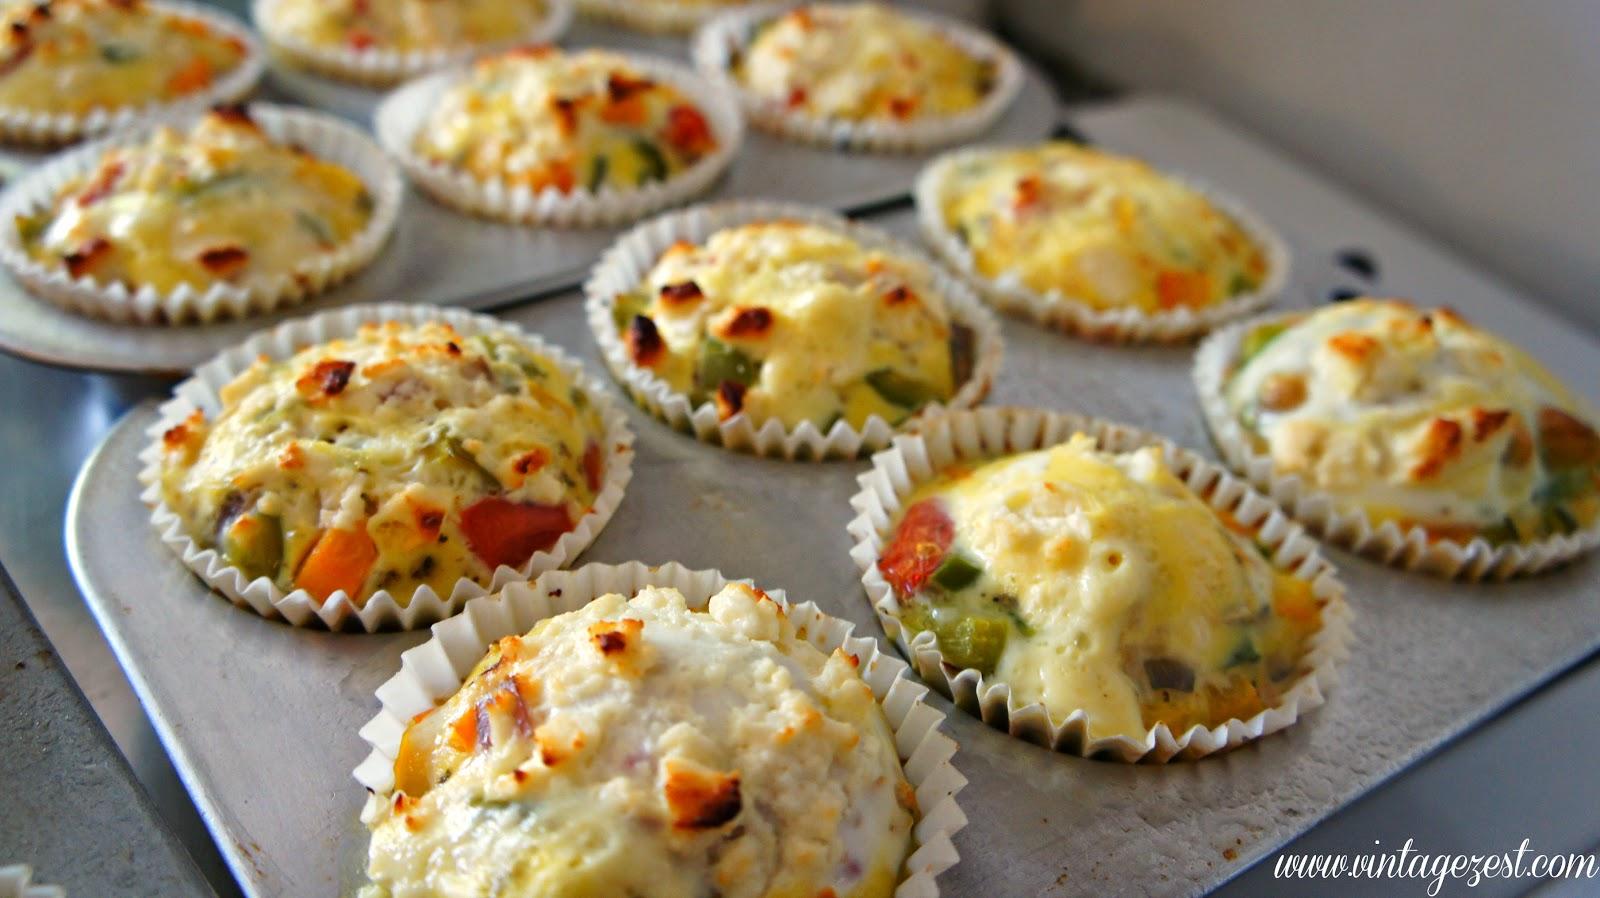 Favorite Breakfast #2: Egg and Veggie Muffins